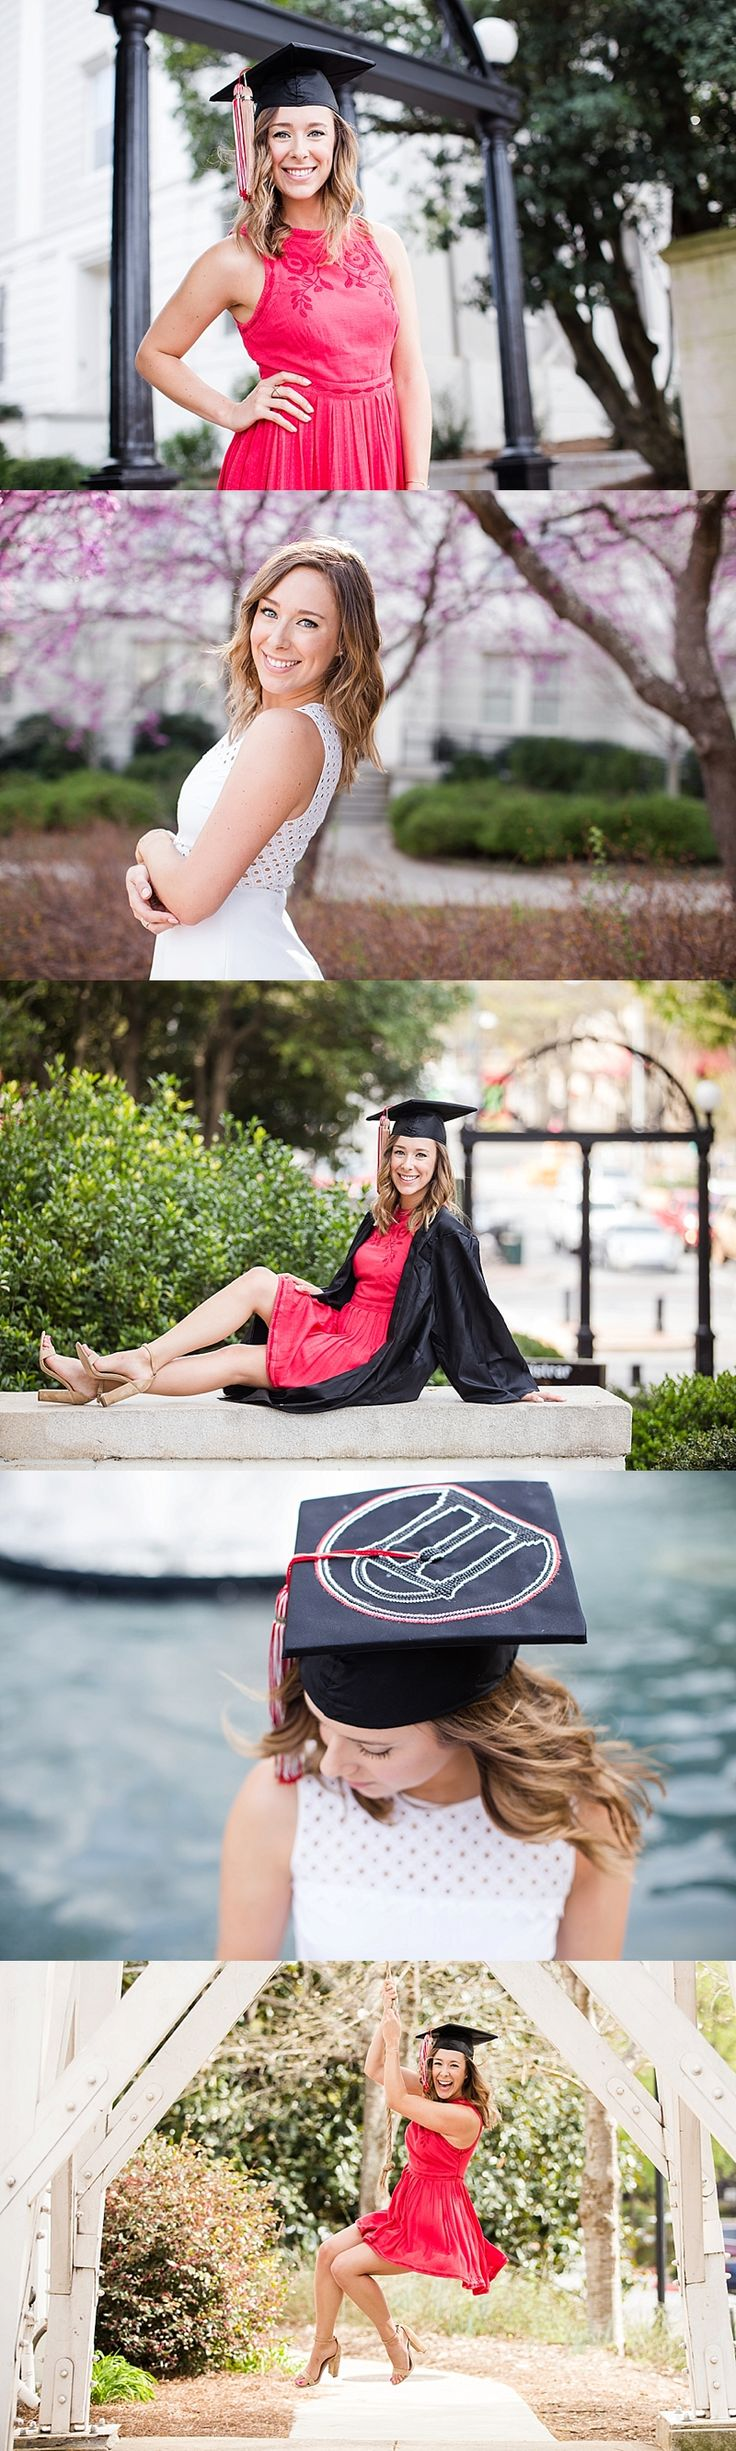 University of Georgia Graduation photos | UGA Senior session | Athens GA Photographer